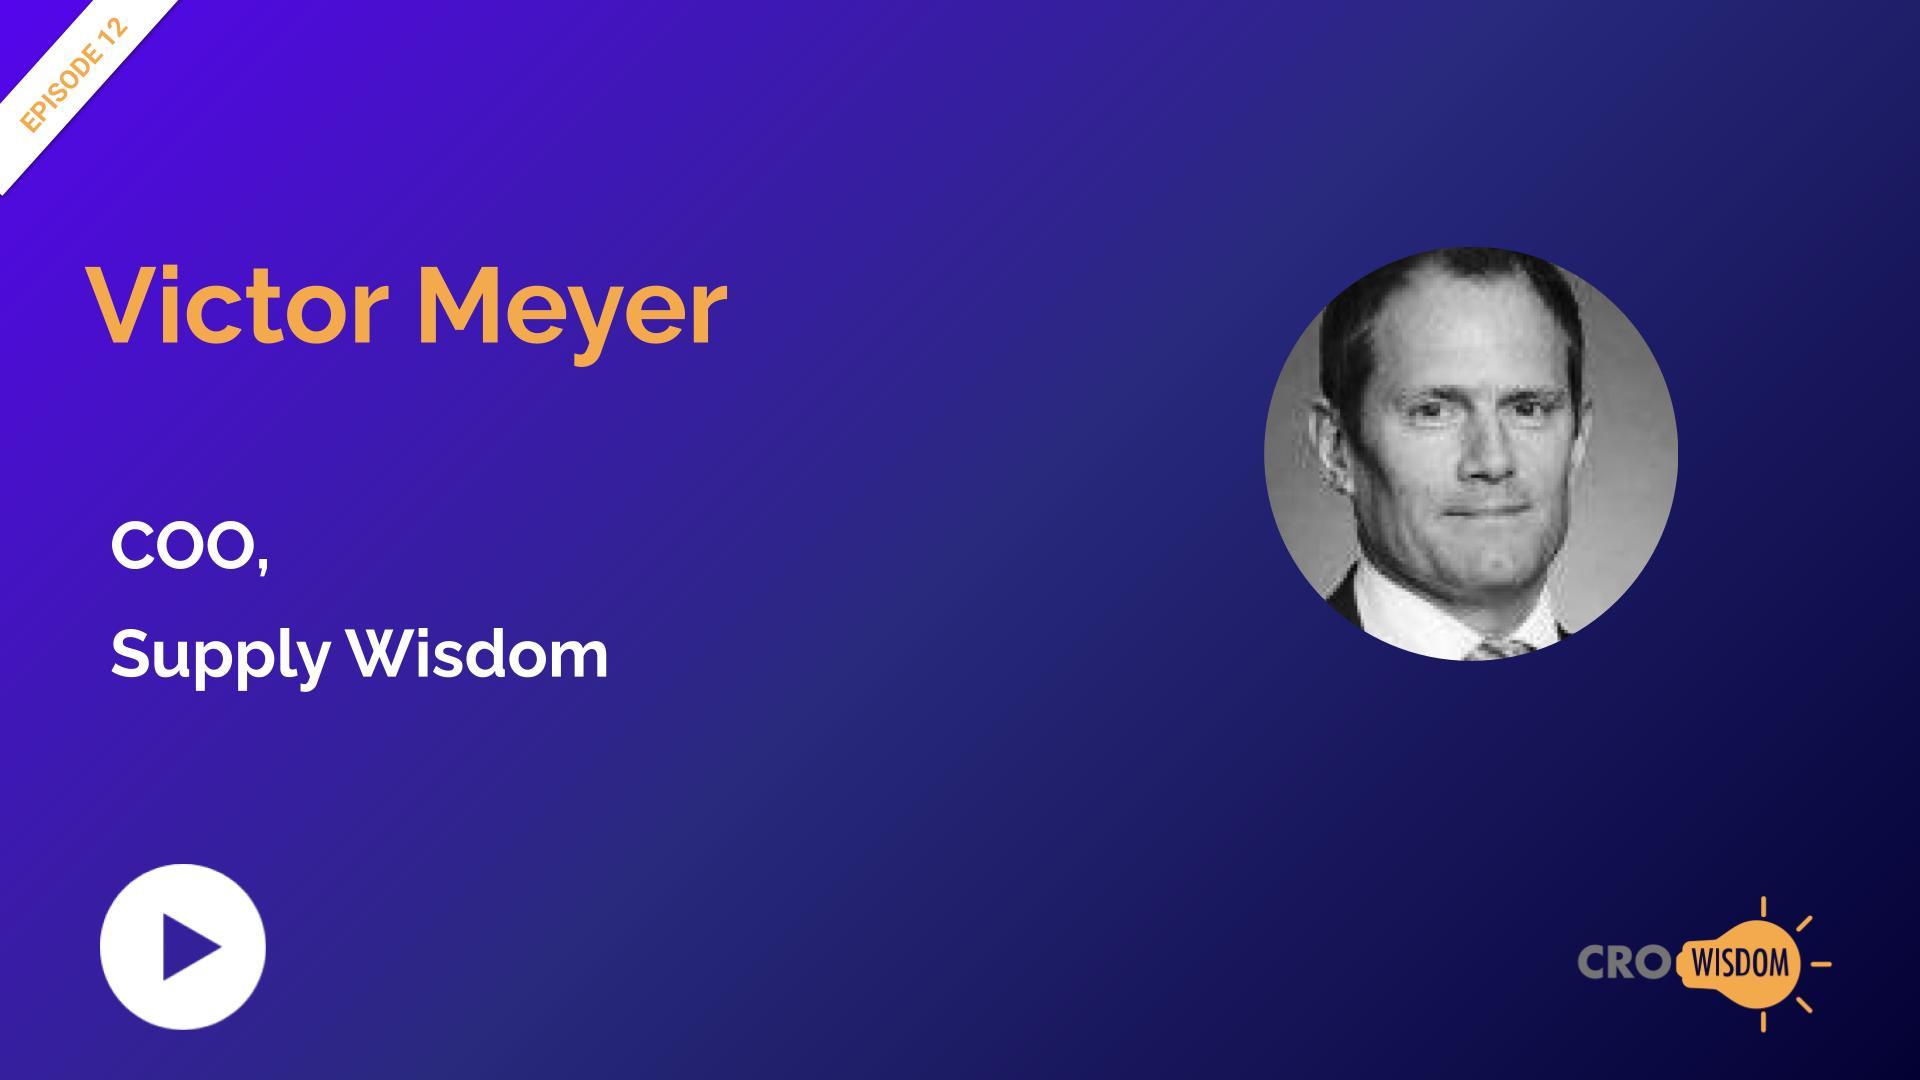 CRO Wisdom Episode 12 with Victor Meyer, COO, Supply Wisdom